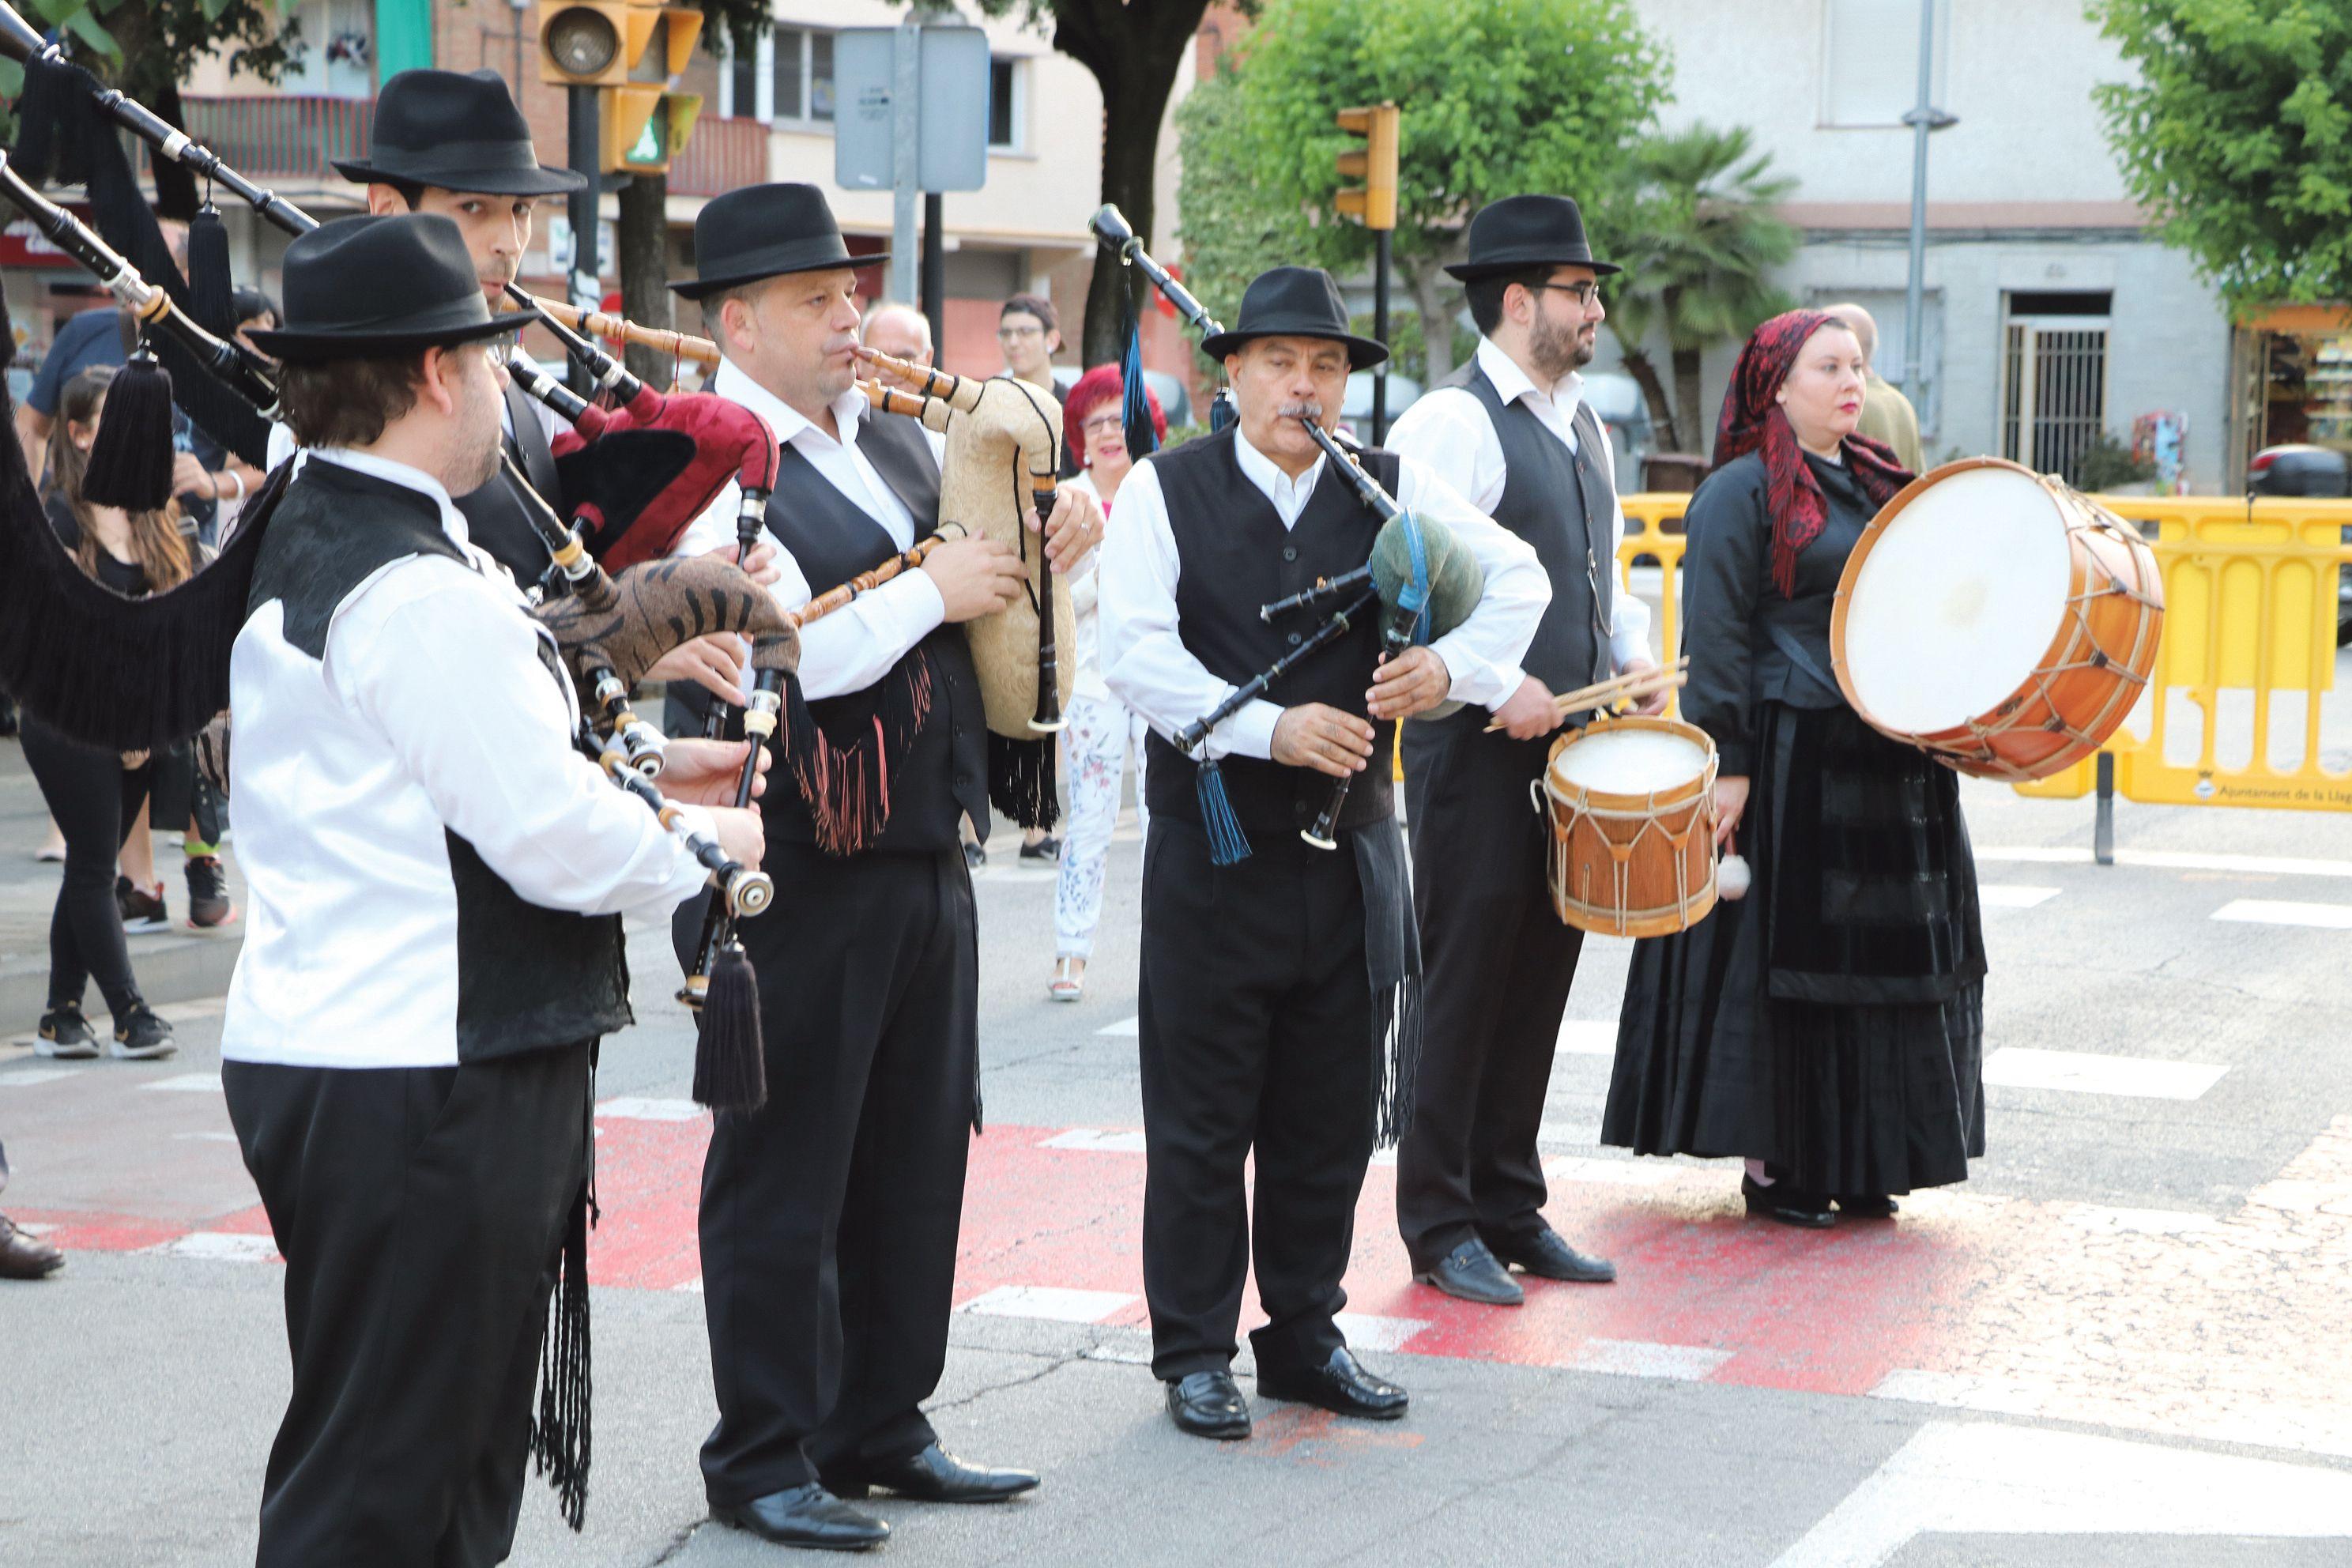 Alborada celebra demà dissabte la festa en honor a Santiago Apòstol